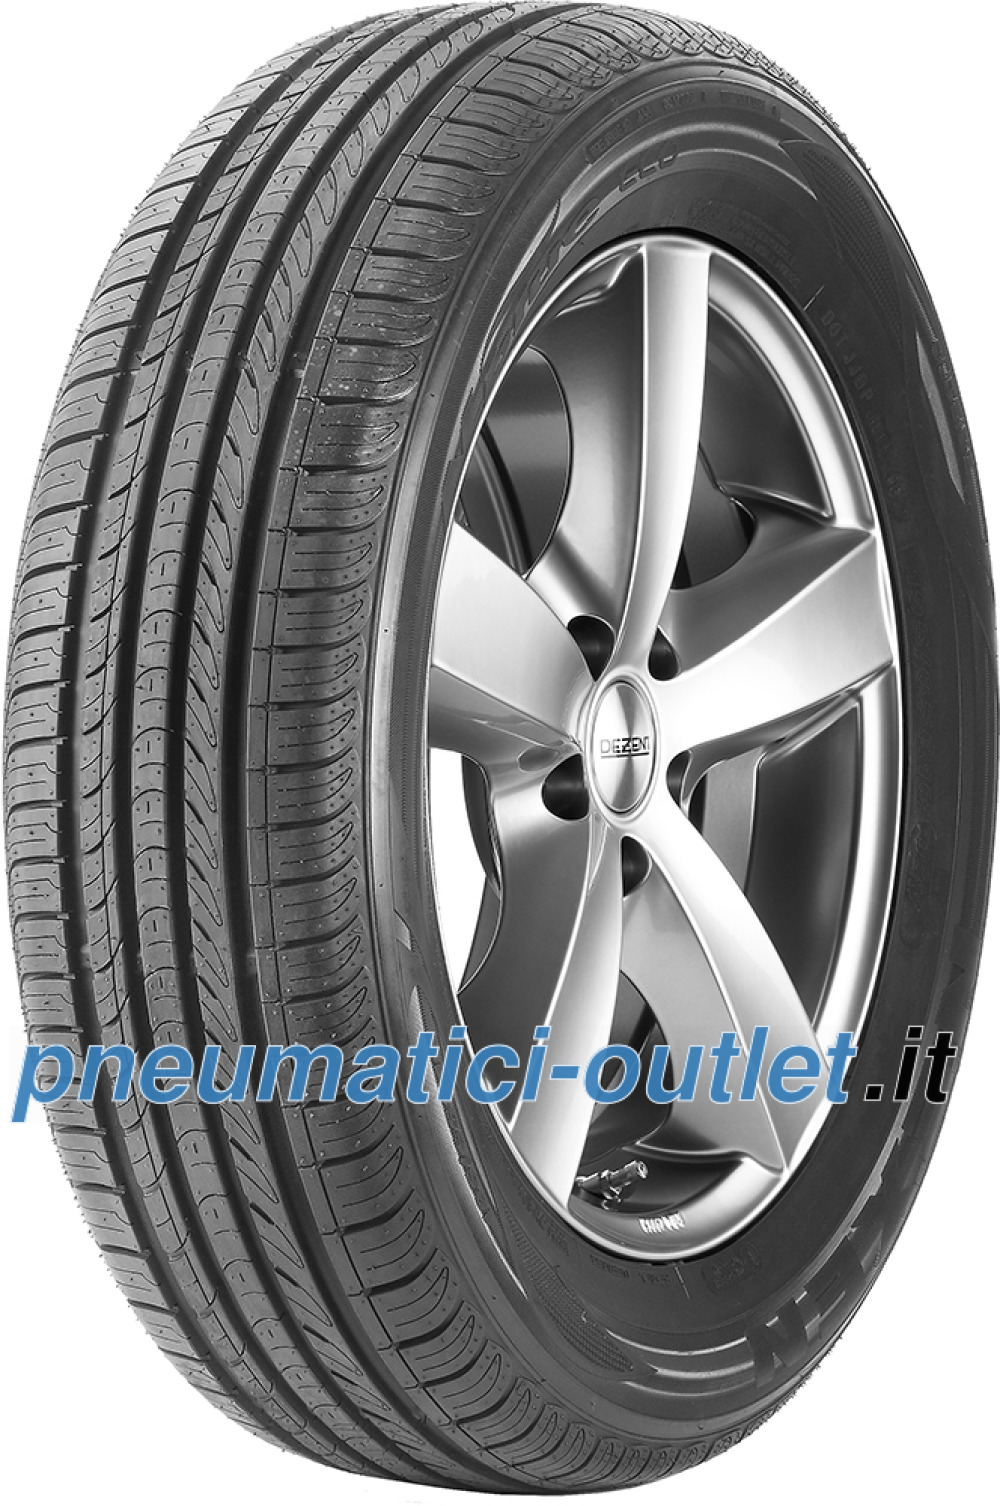 Nexen N blue Eco ( 175/70 R14 84T 4PR )